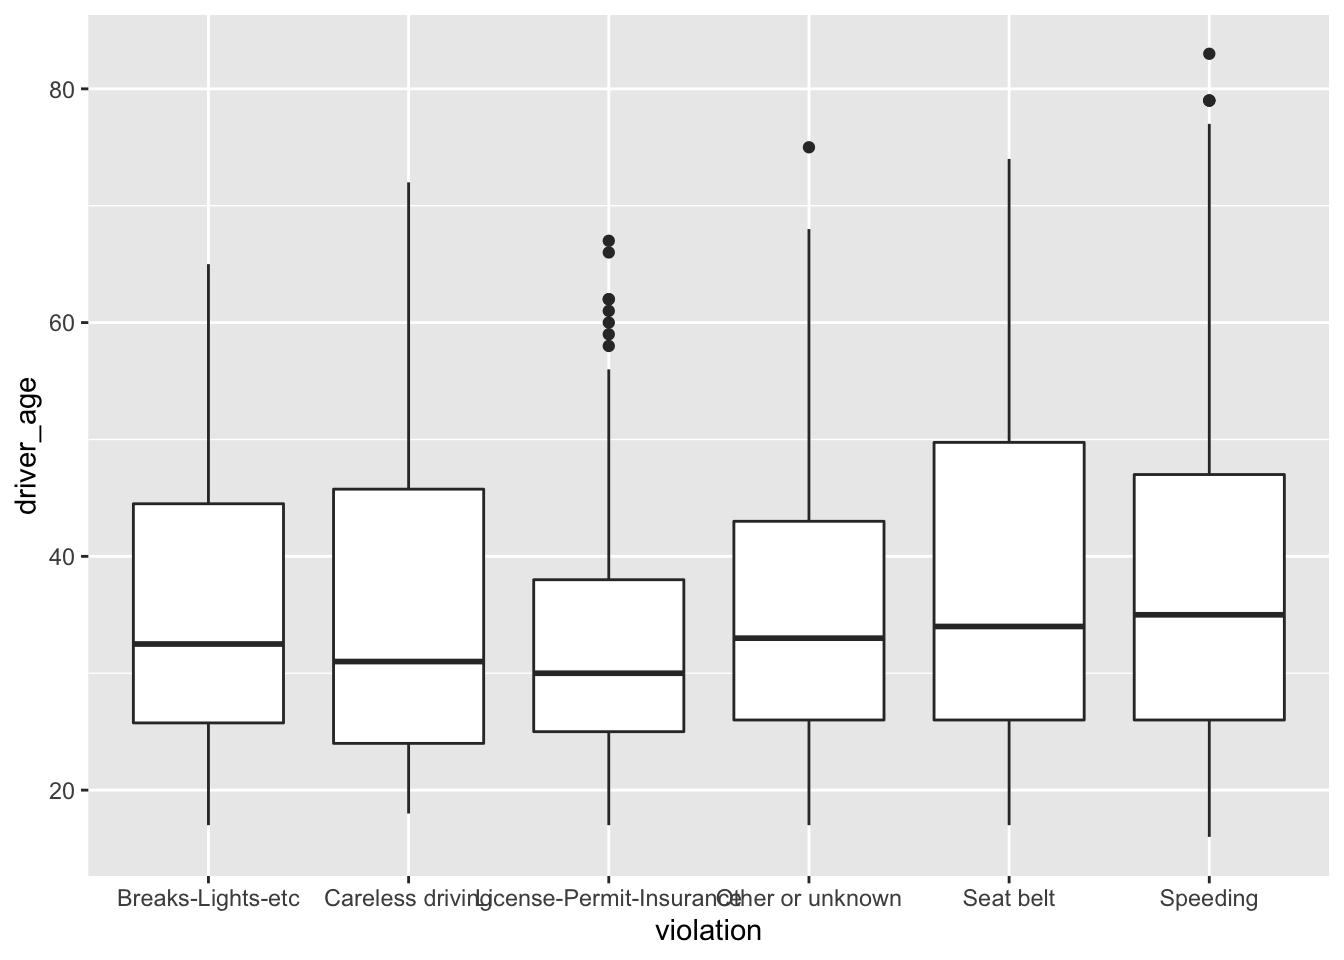 Chapter 3 Data Visualization with ggplot2 | Data Wrangling